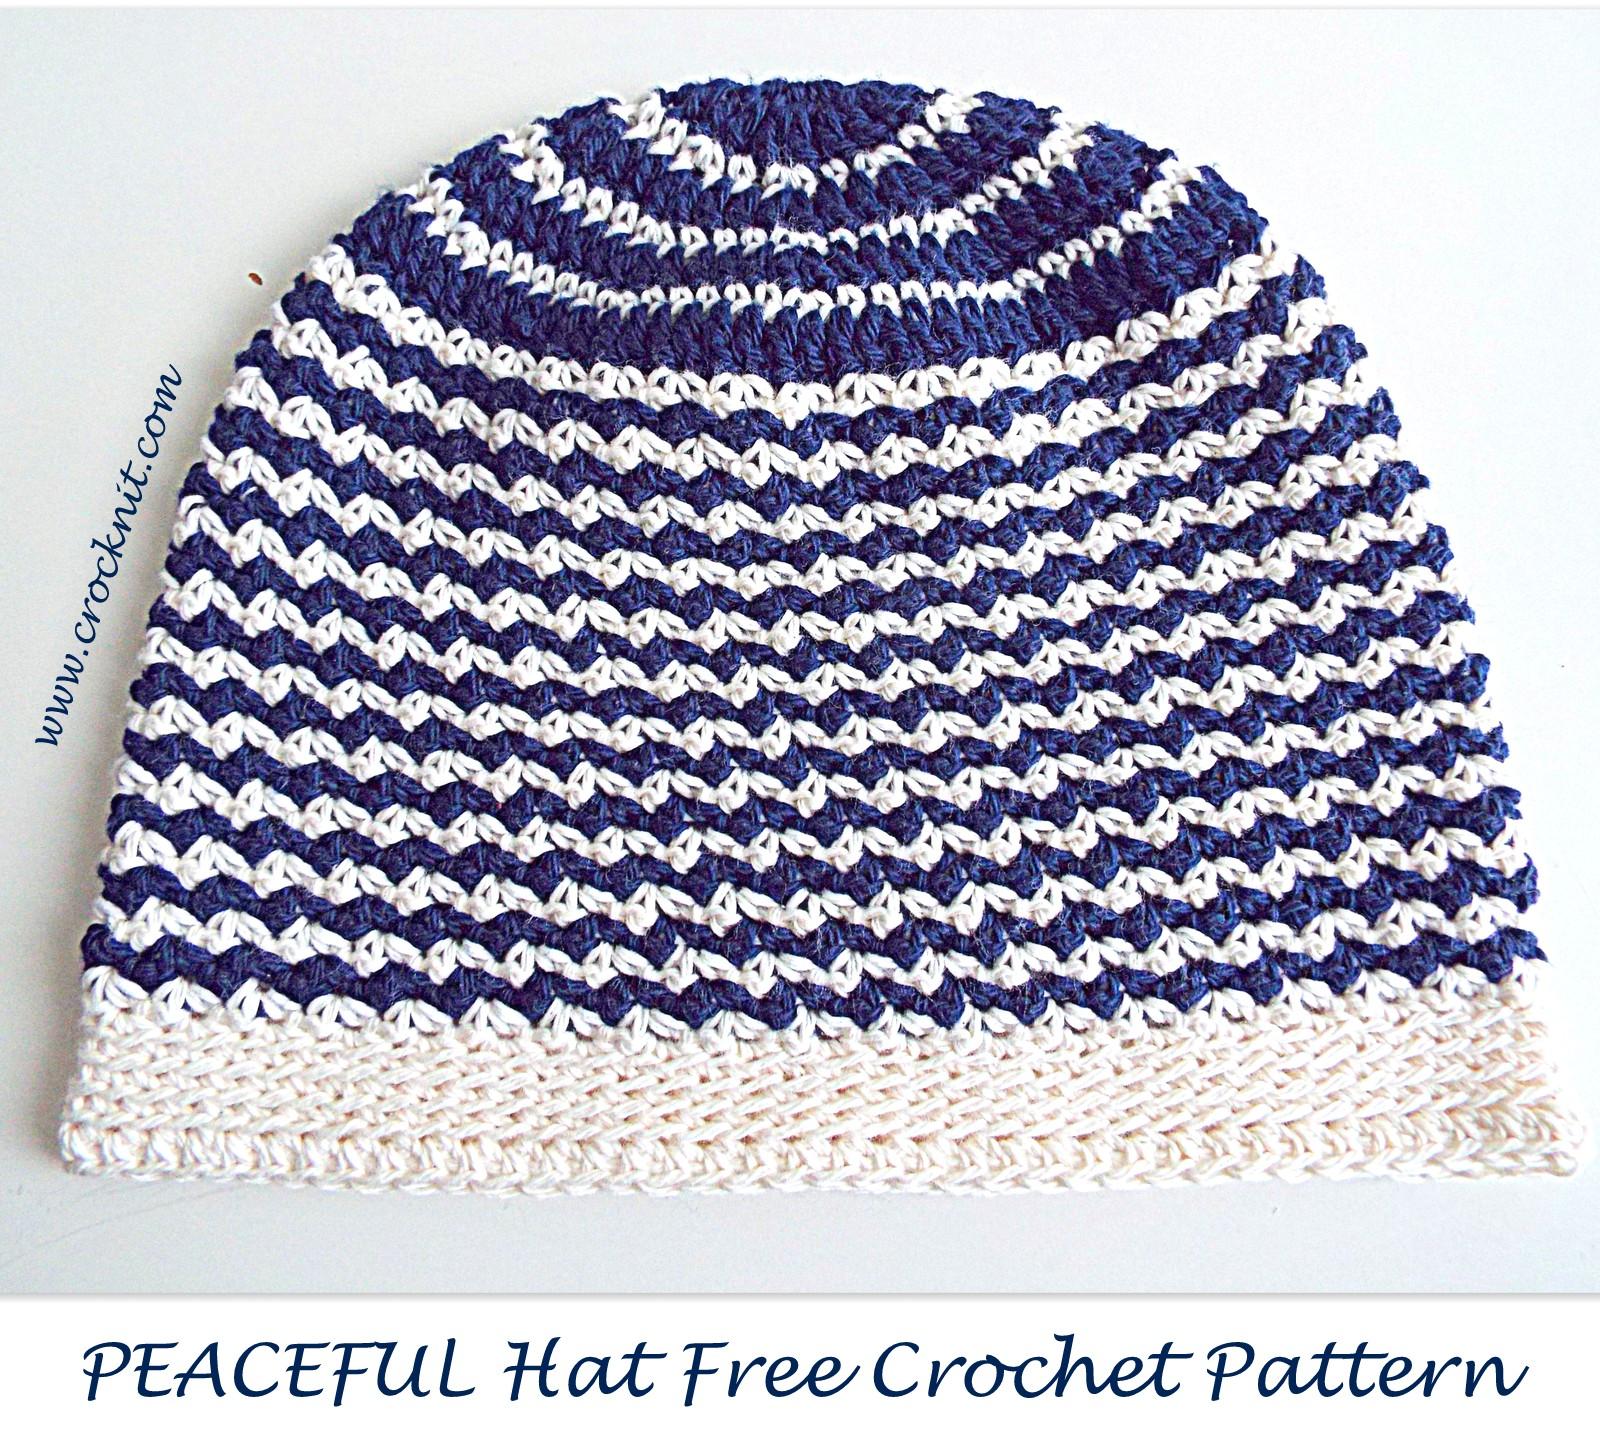 MICROCKNIT CREATIONS: SLEEP Hats Free Crochet Pattern #3 PEACEFUL HAT